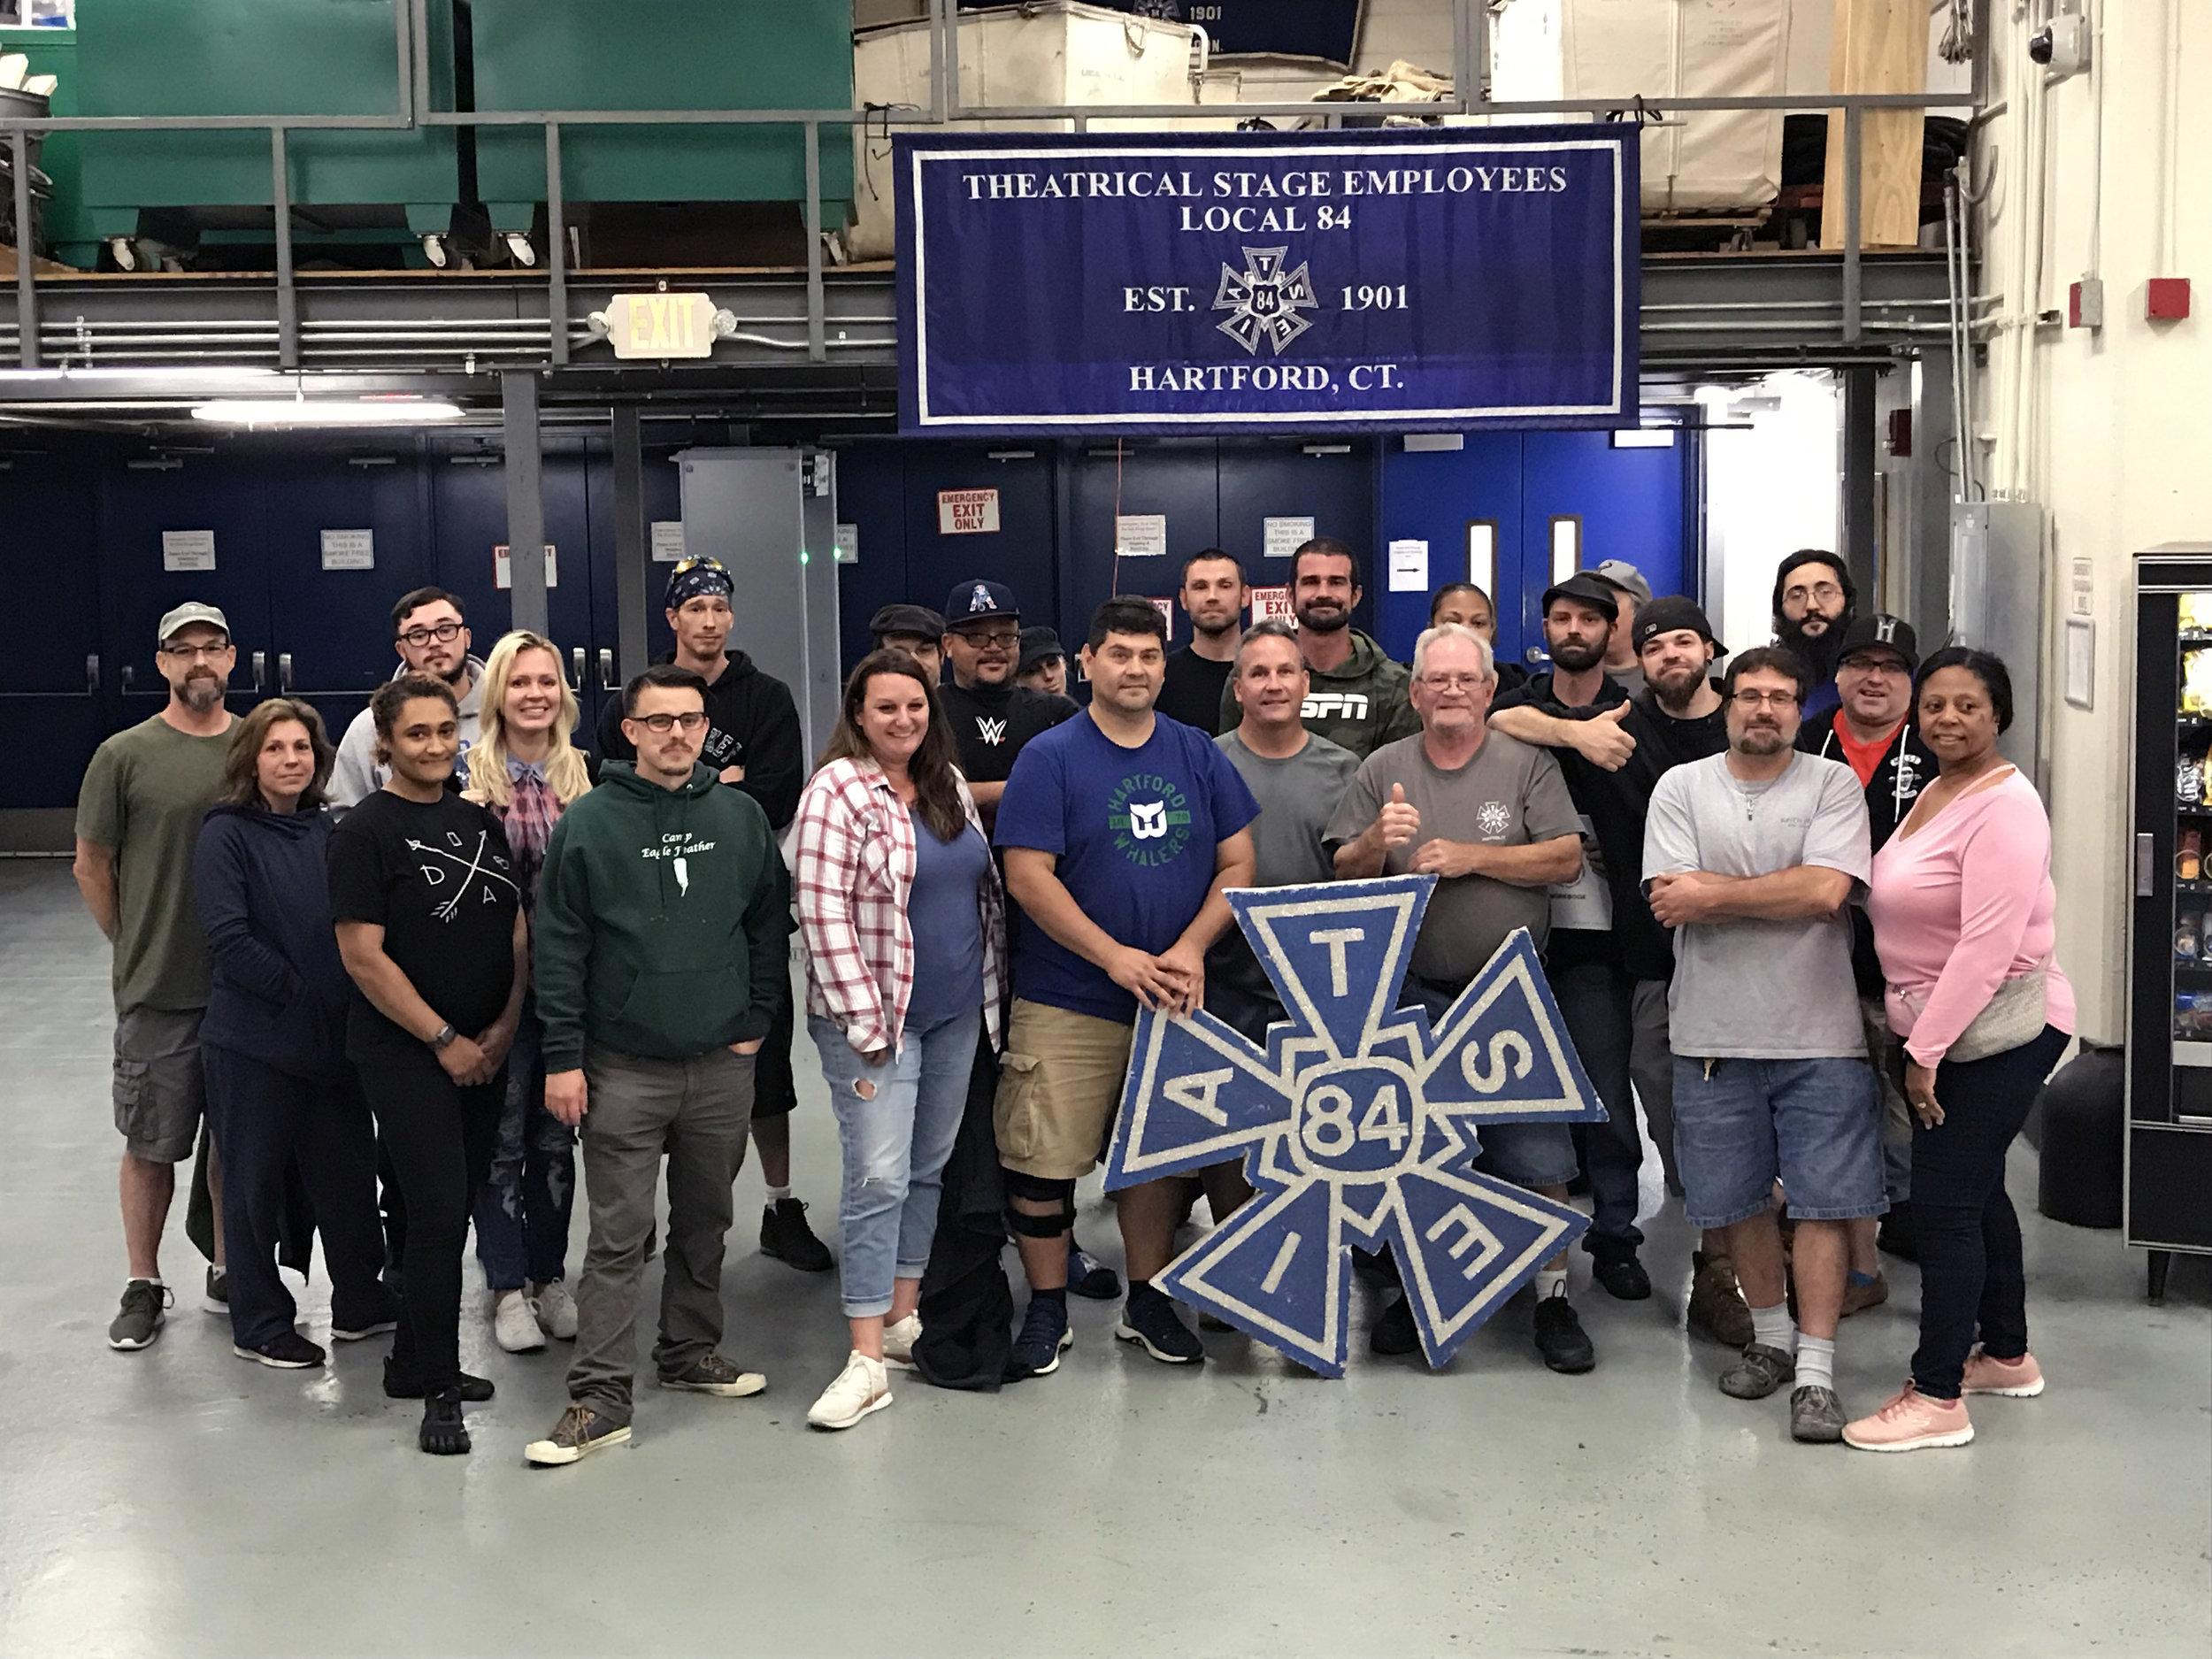 IATSE TTF OSHA 10/General Entertainment Safety in Hartford, CT | September 23-24, 2019